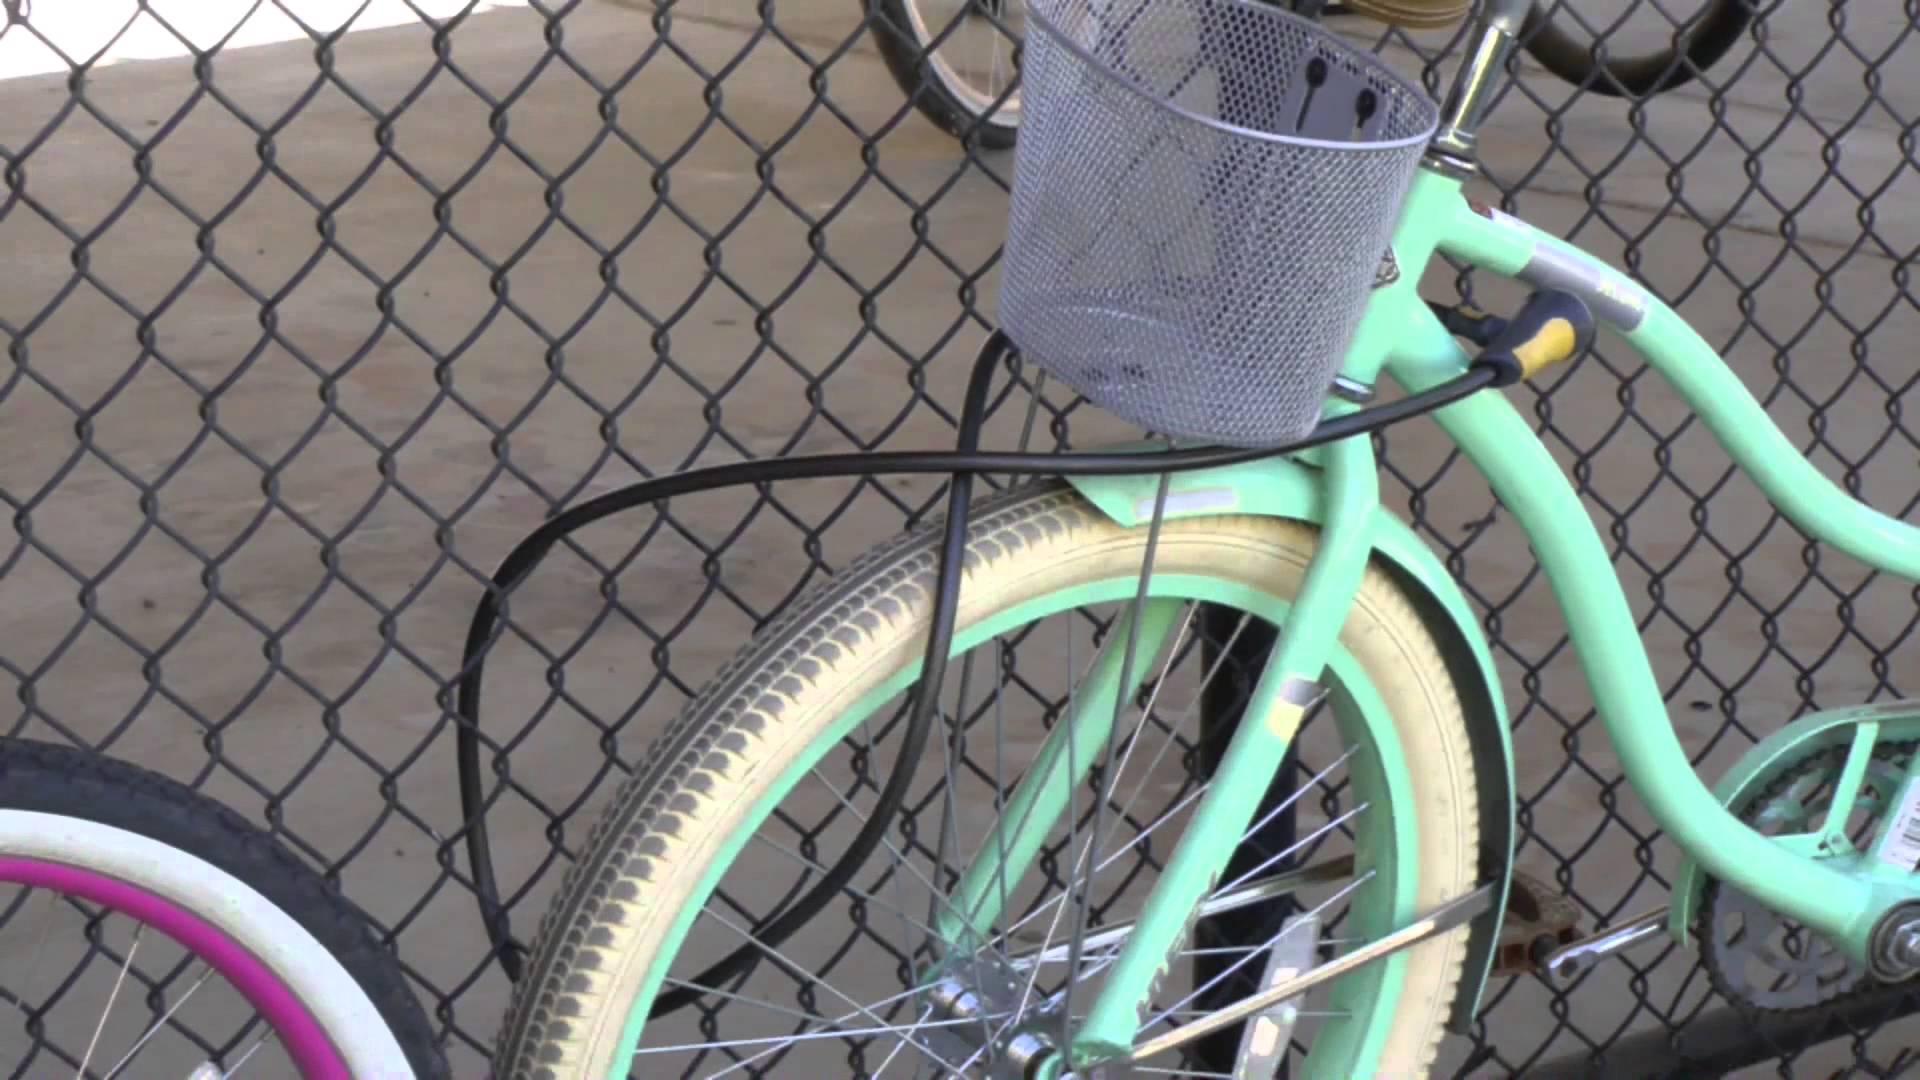 Bike Thefts at CSUN